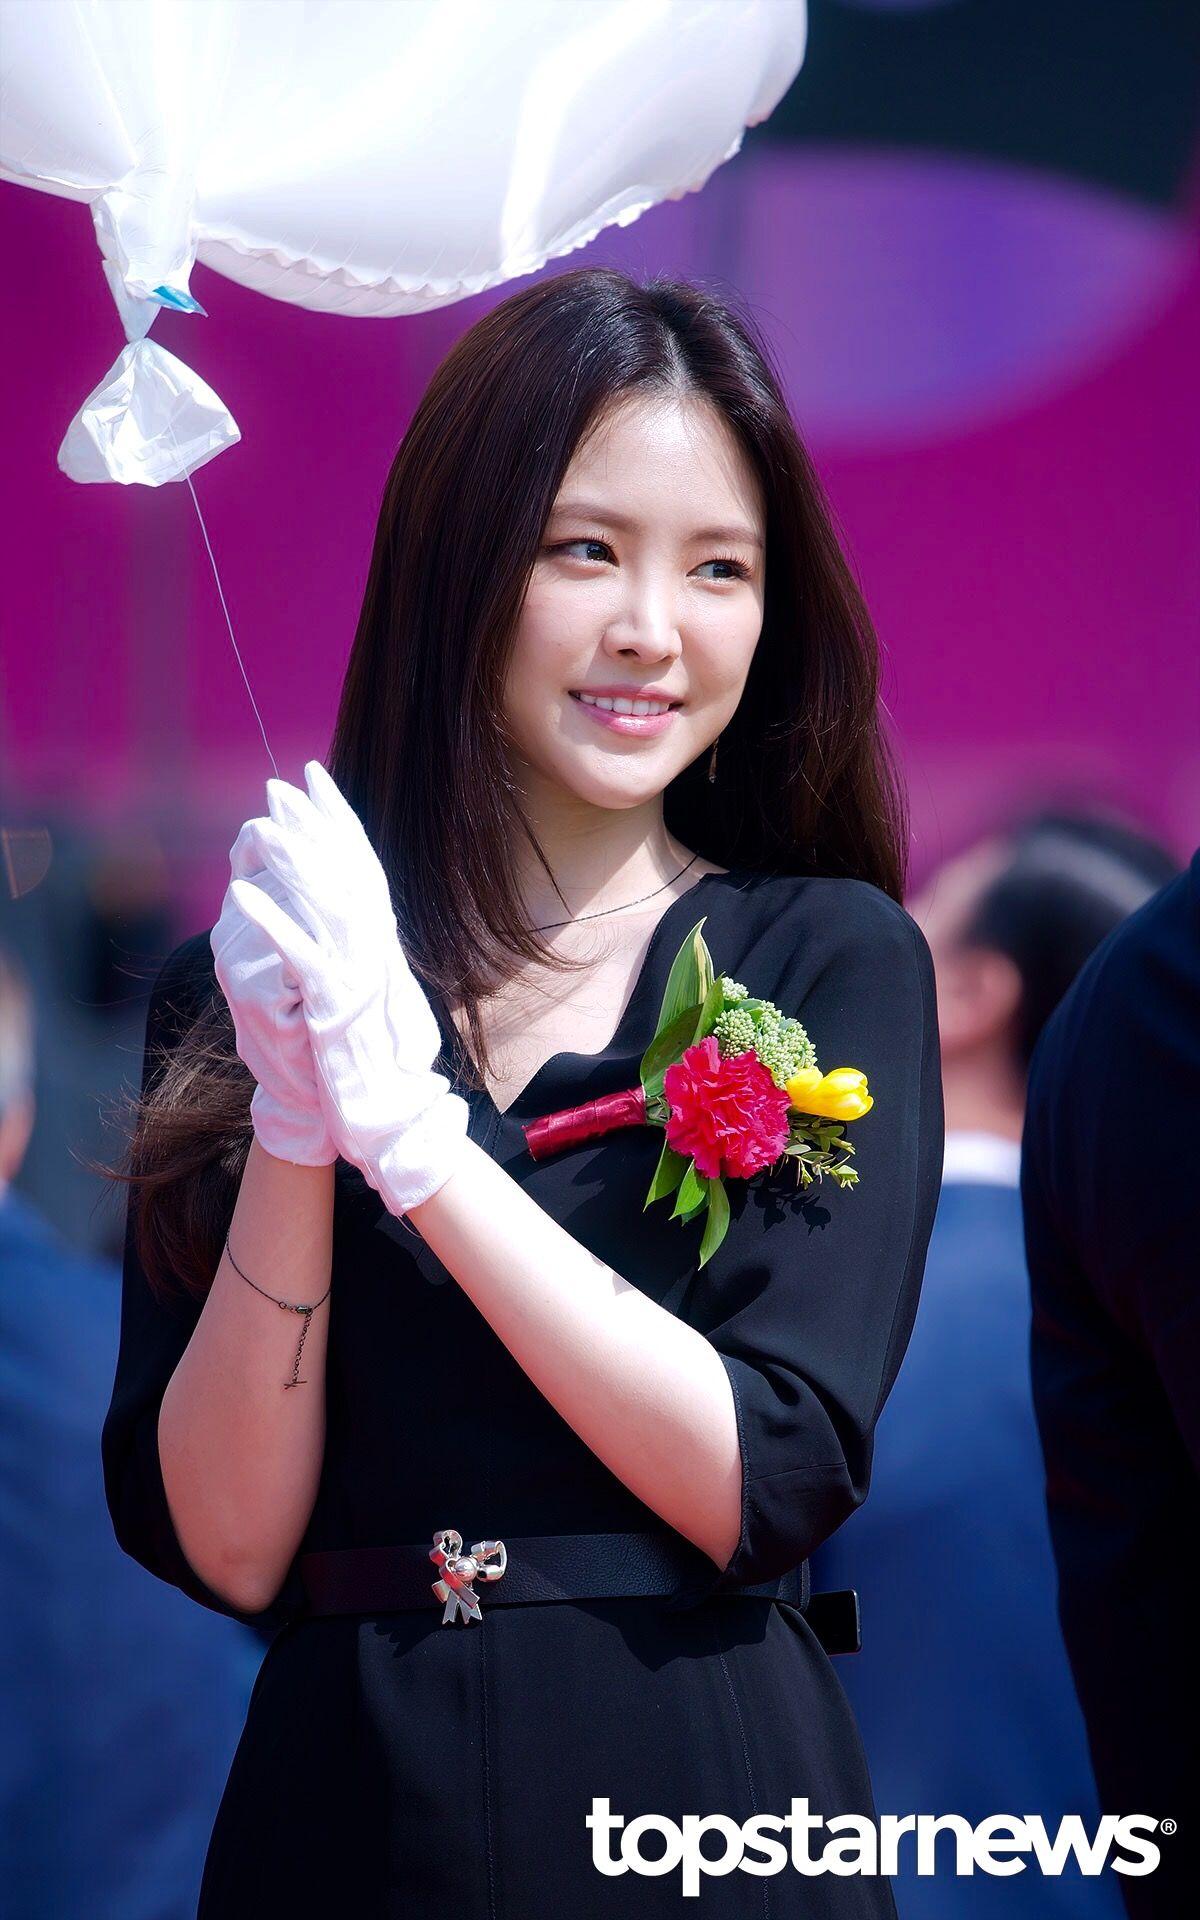 Pin by Mika Kato on Apink naeun | Flower girl dresses ...